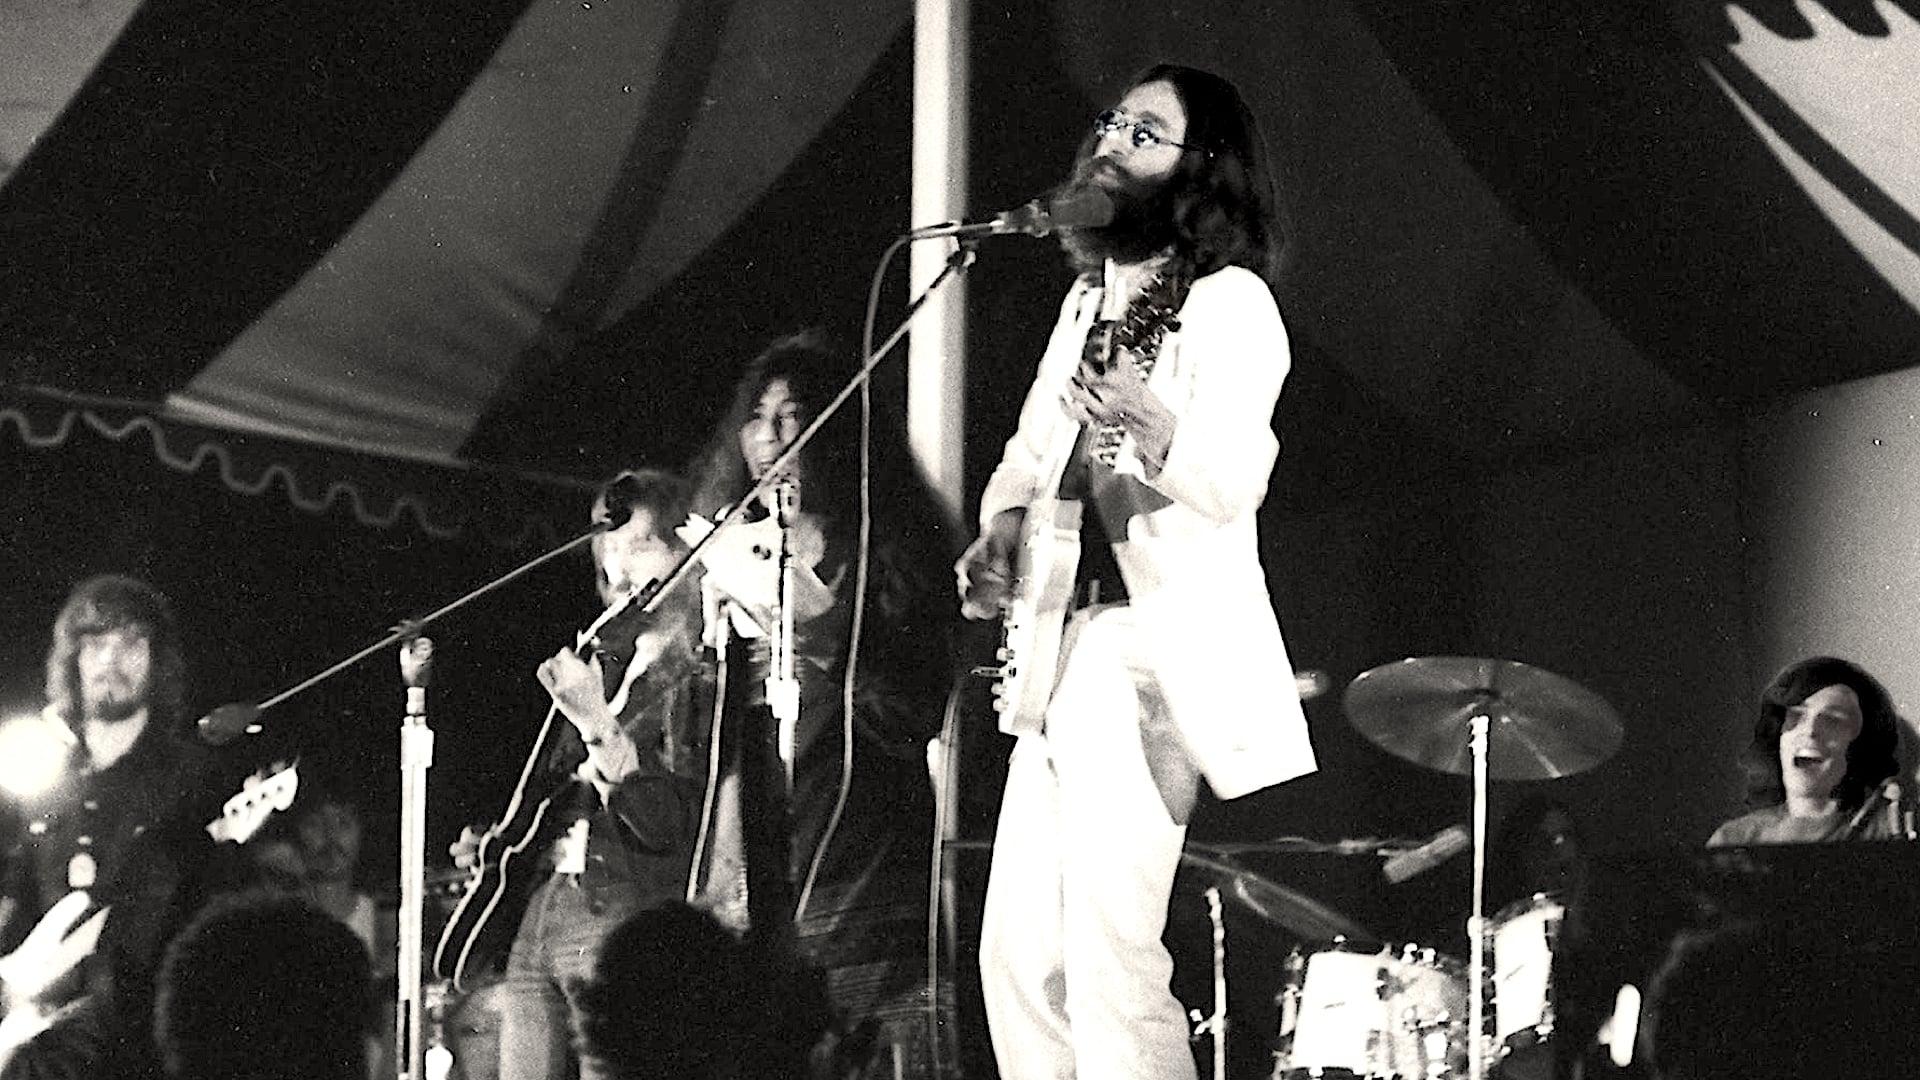 「john lennon 1969 toronto」の画像検索結果